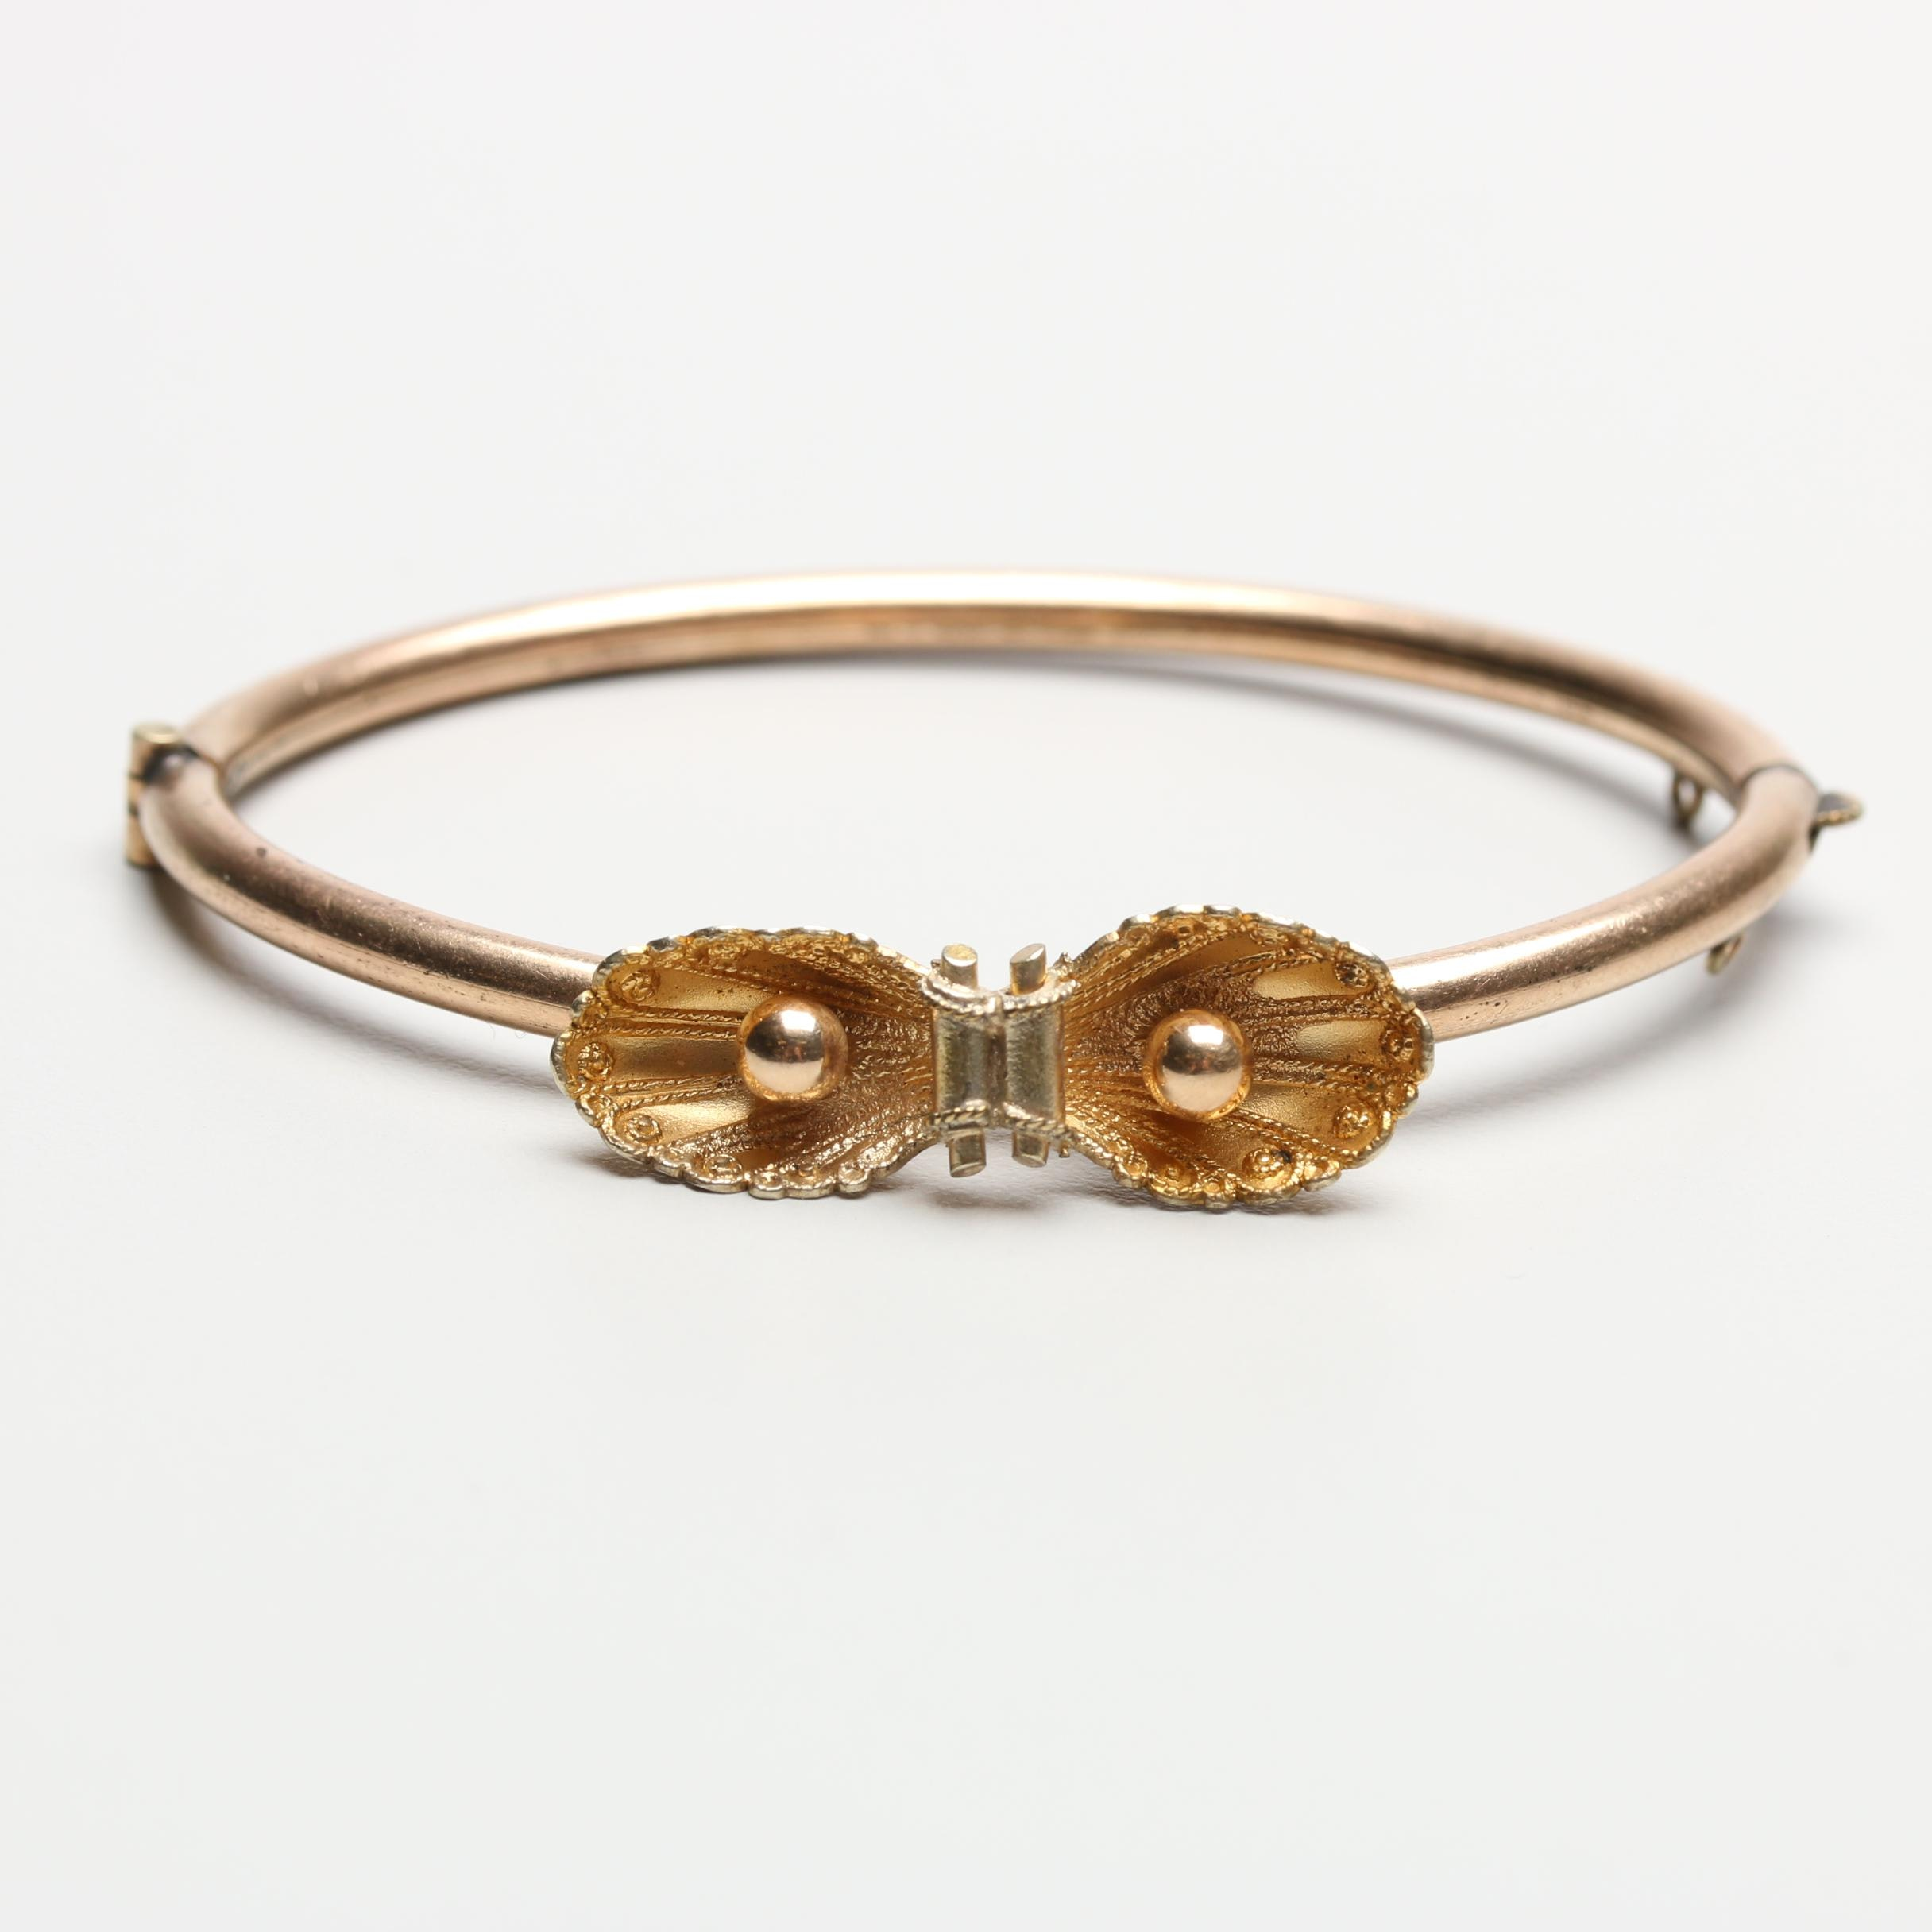 Victorian Gold Tone Hinged Bangle Bracelet